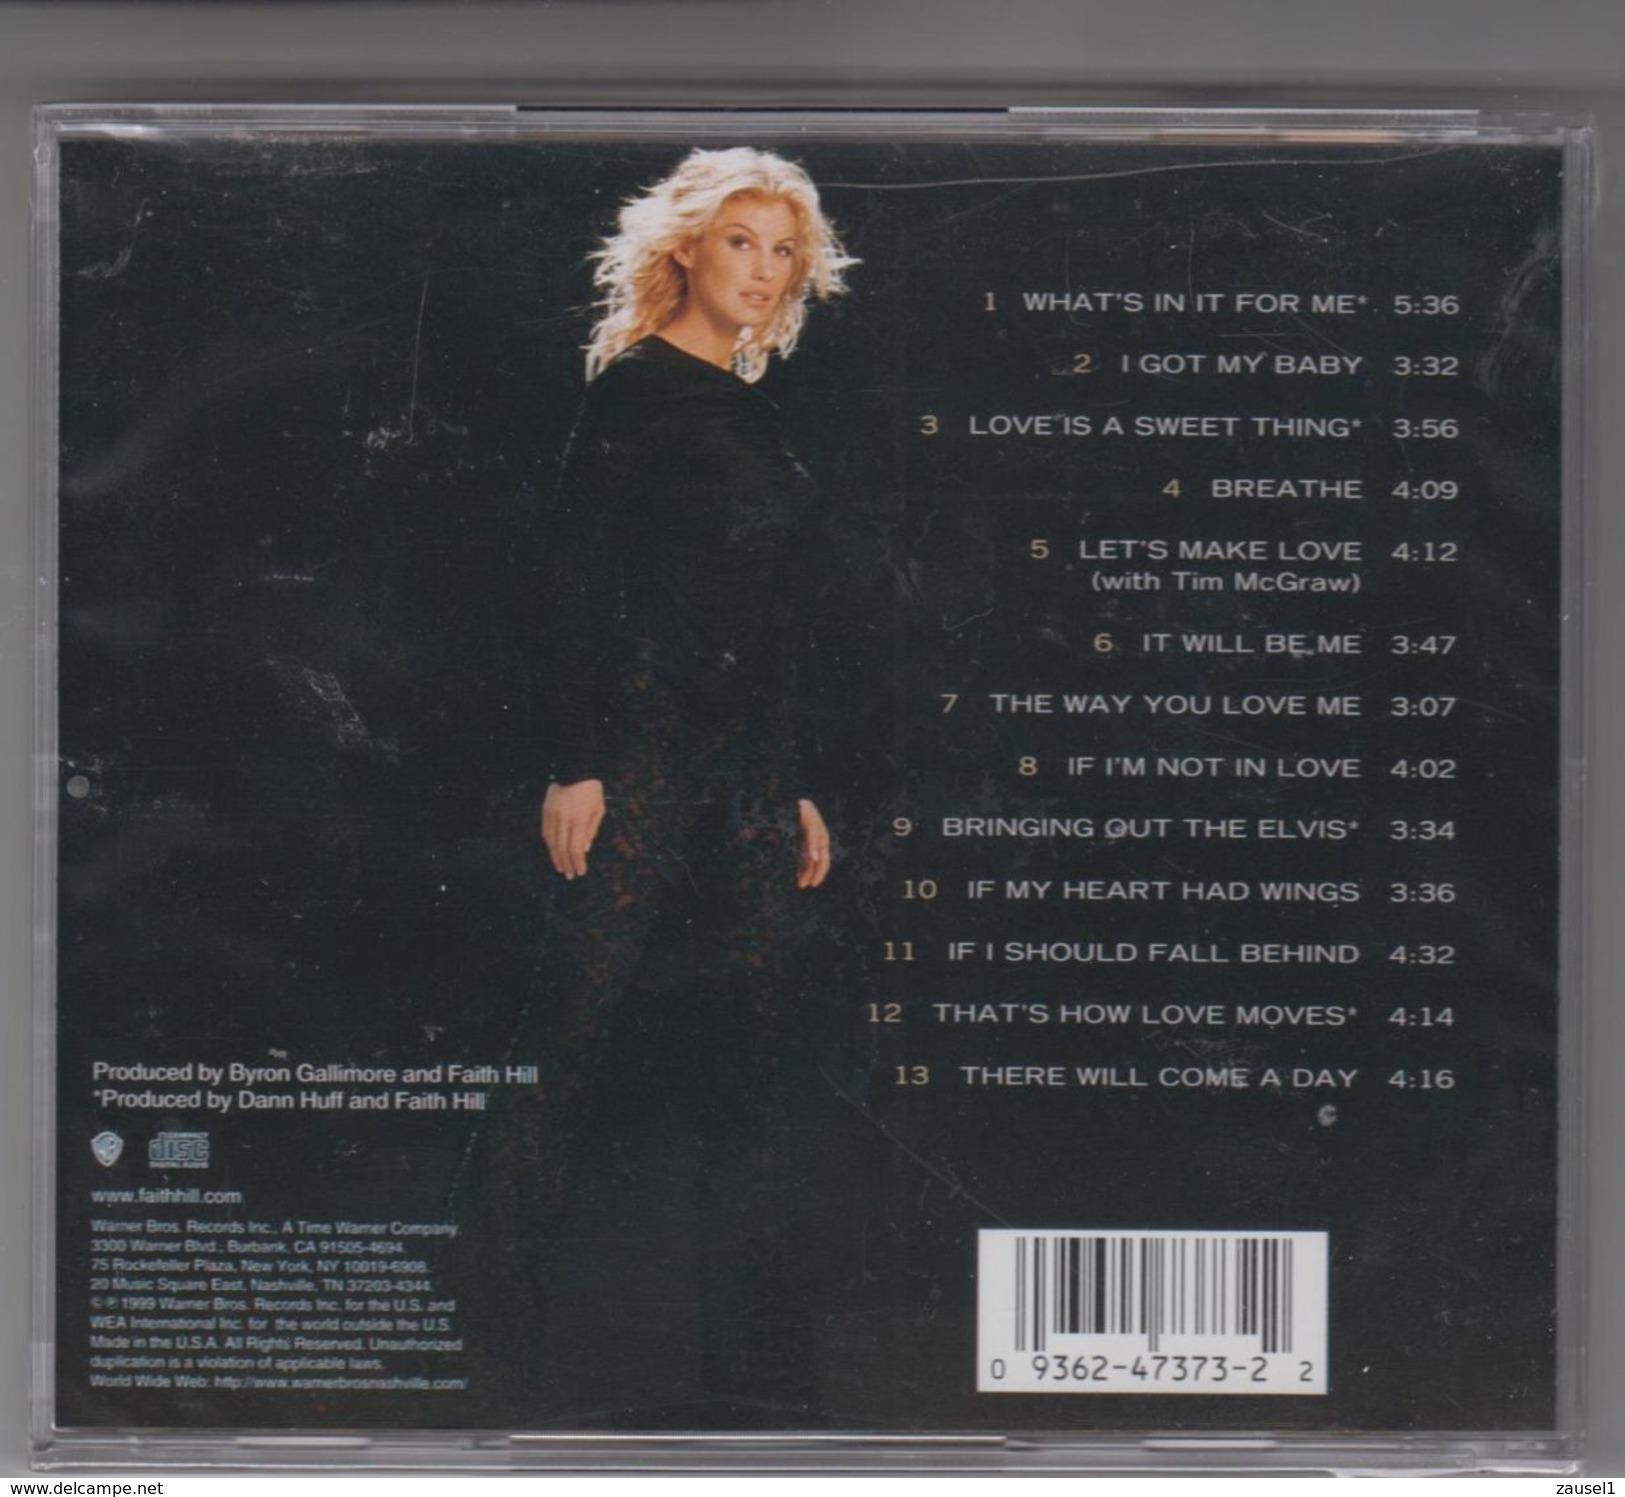 Faith Hill - Breathe - Original CD - Neu, Noch Eingeschweißt - Country & Folk